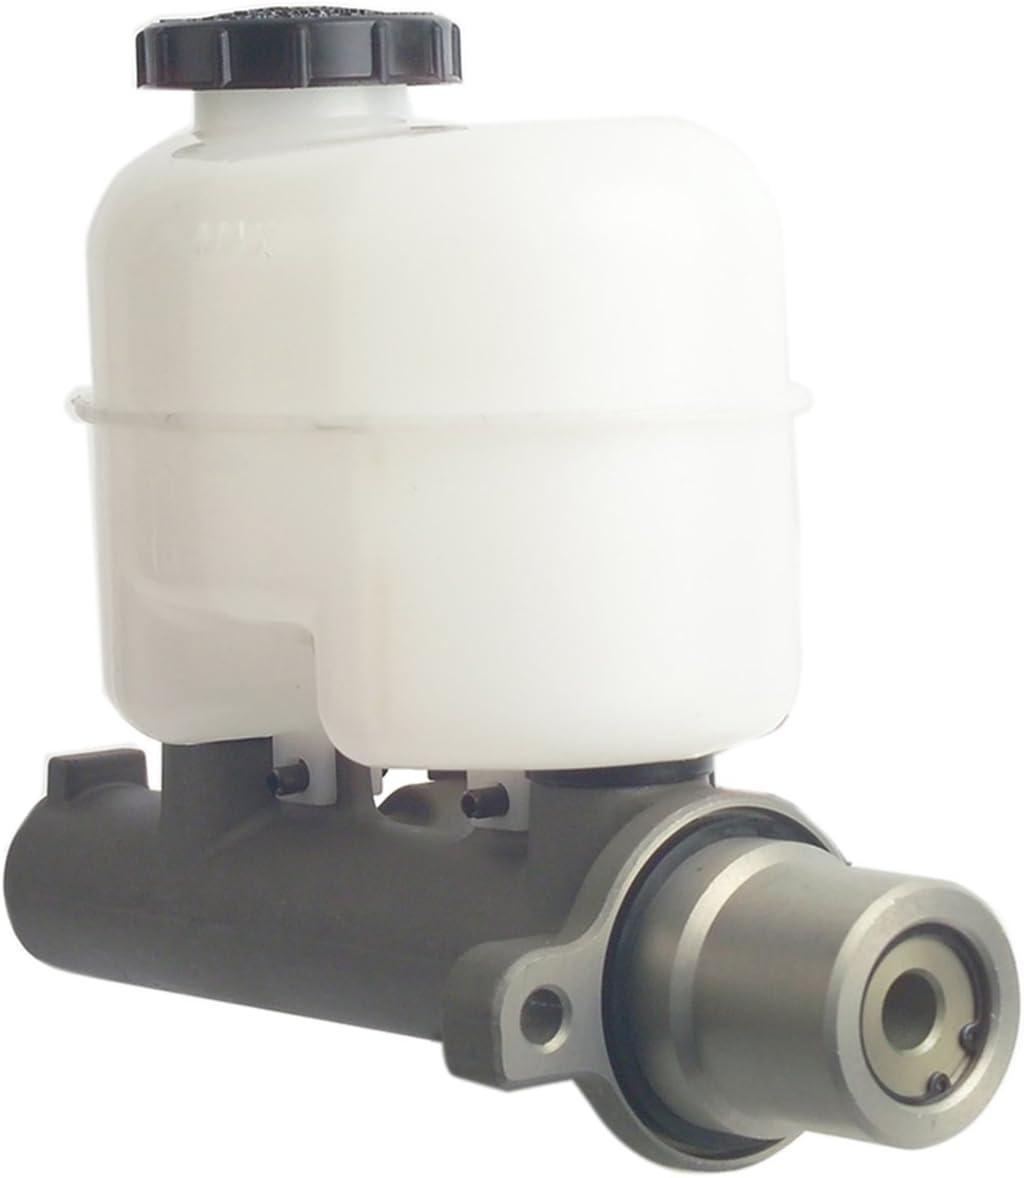 Cardone Select 13-3084 New Brake Master Cylinder F-150 08-04; Lobo 08-05; Mark LT 08-06